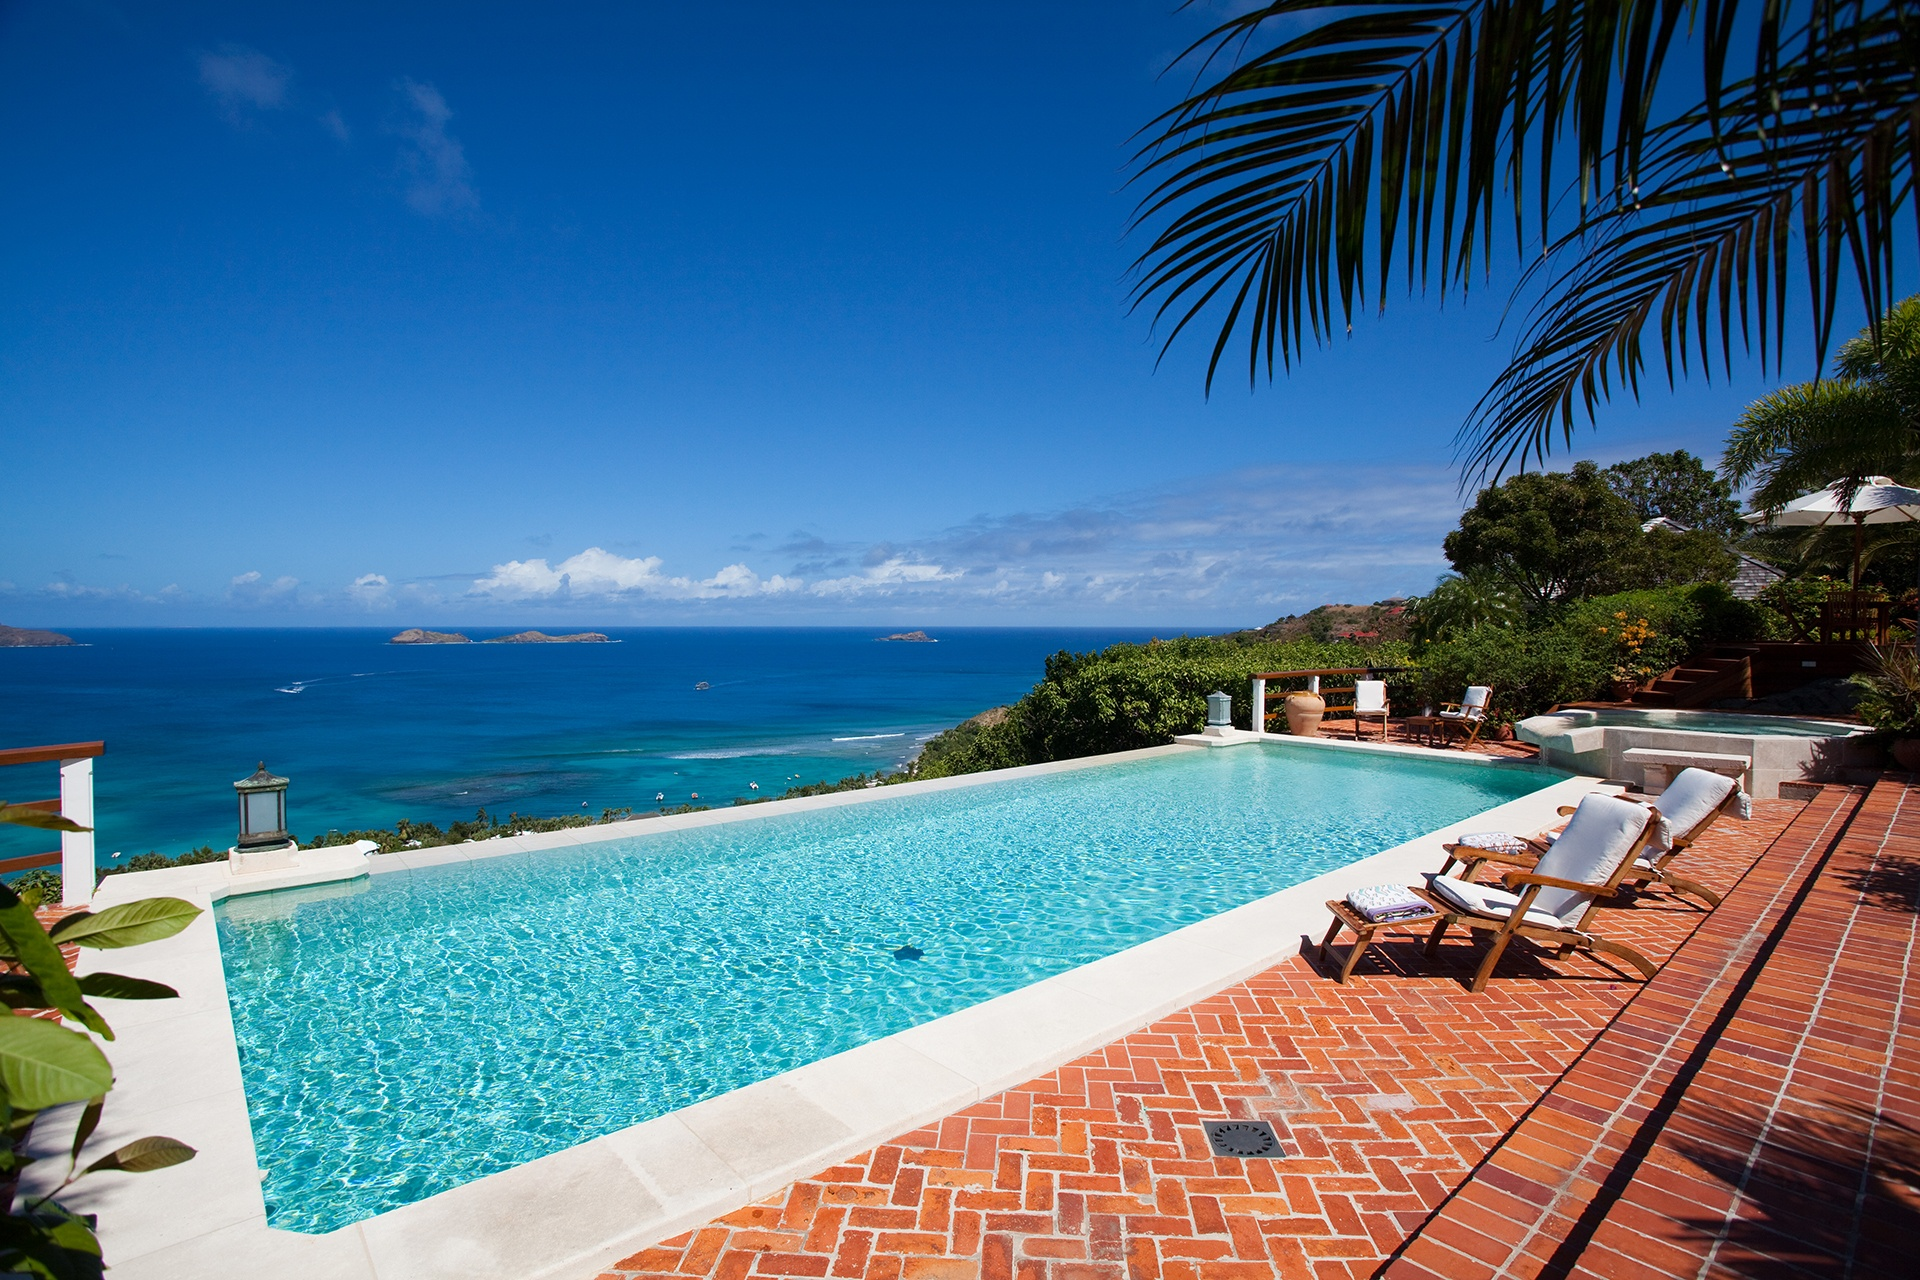 Petite Saline, St. Barths, French West Indies